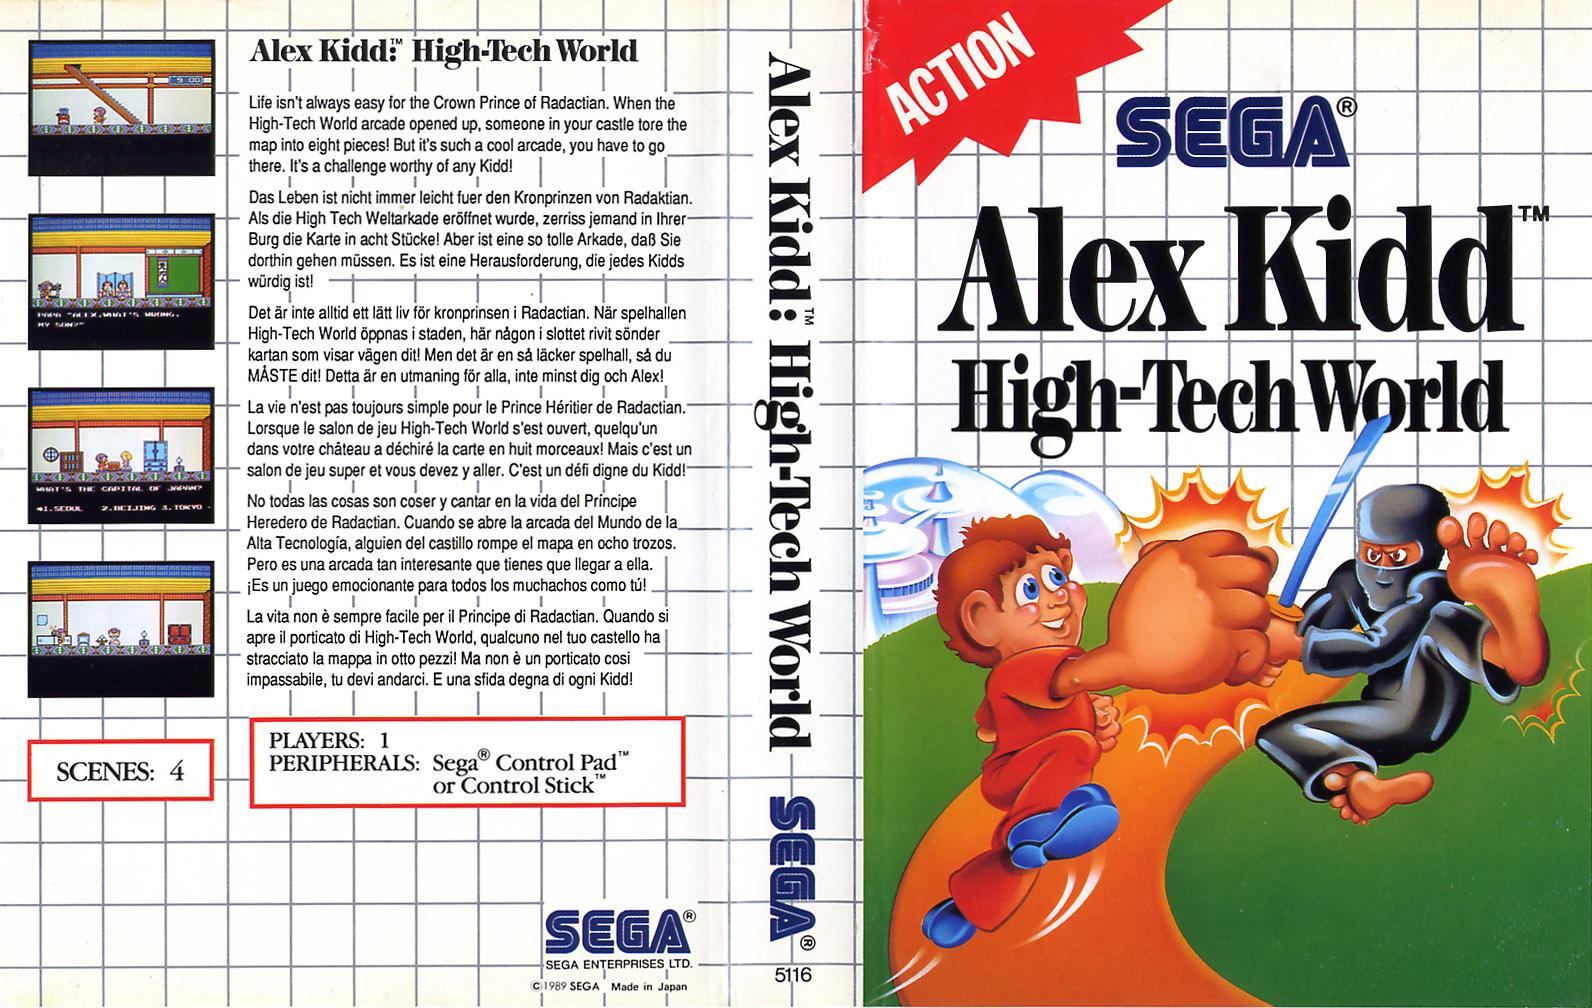 [Série] Alex Kidd - Master System & Mega Drive AlexKiddHighTechWorld-SMS-EU